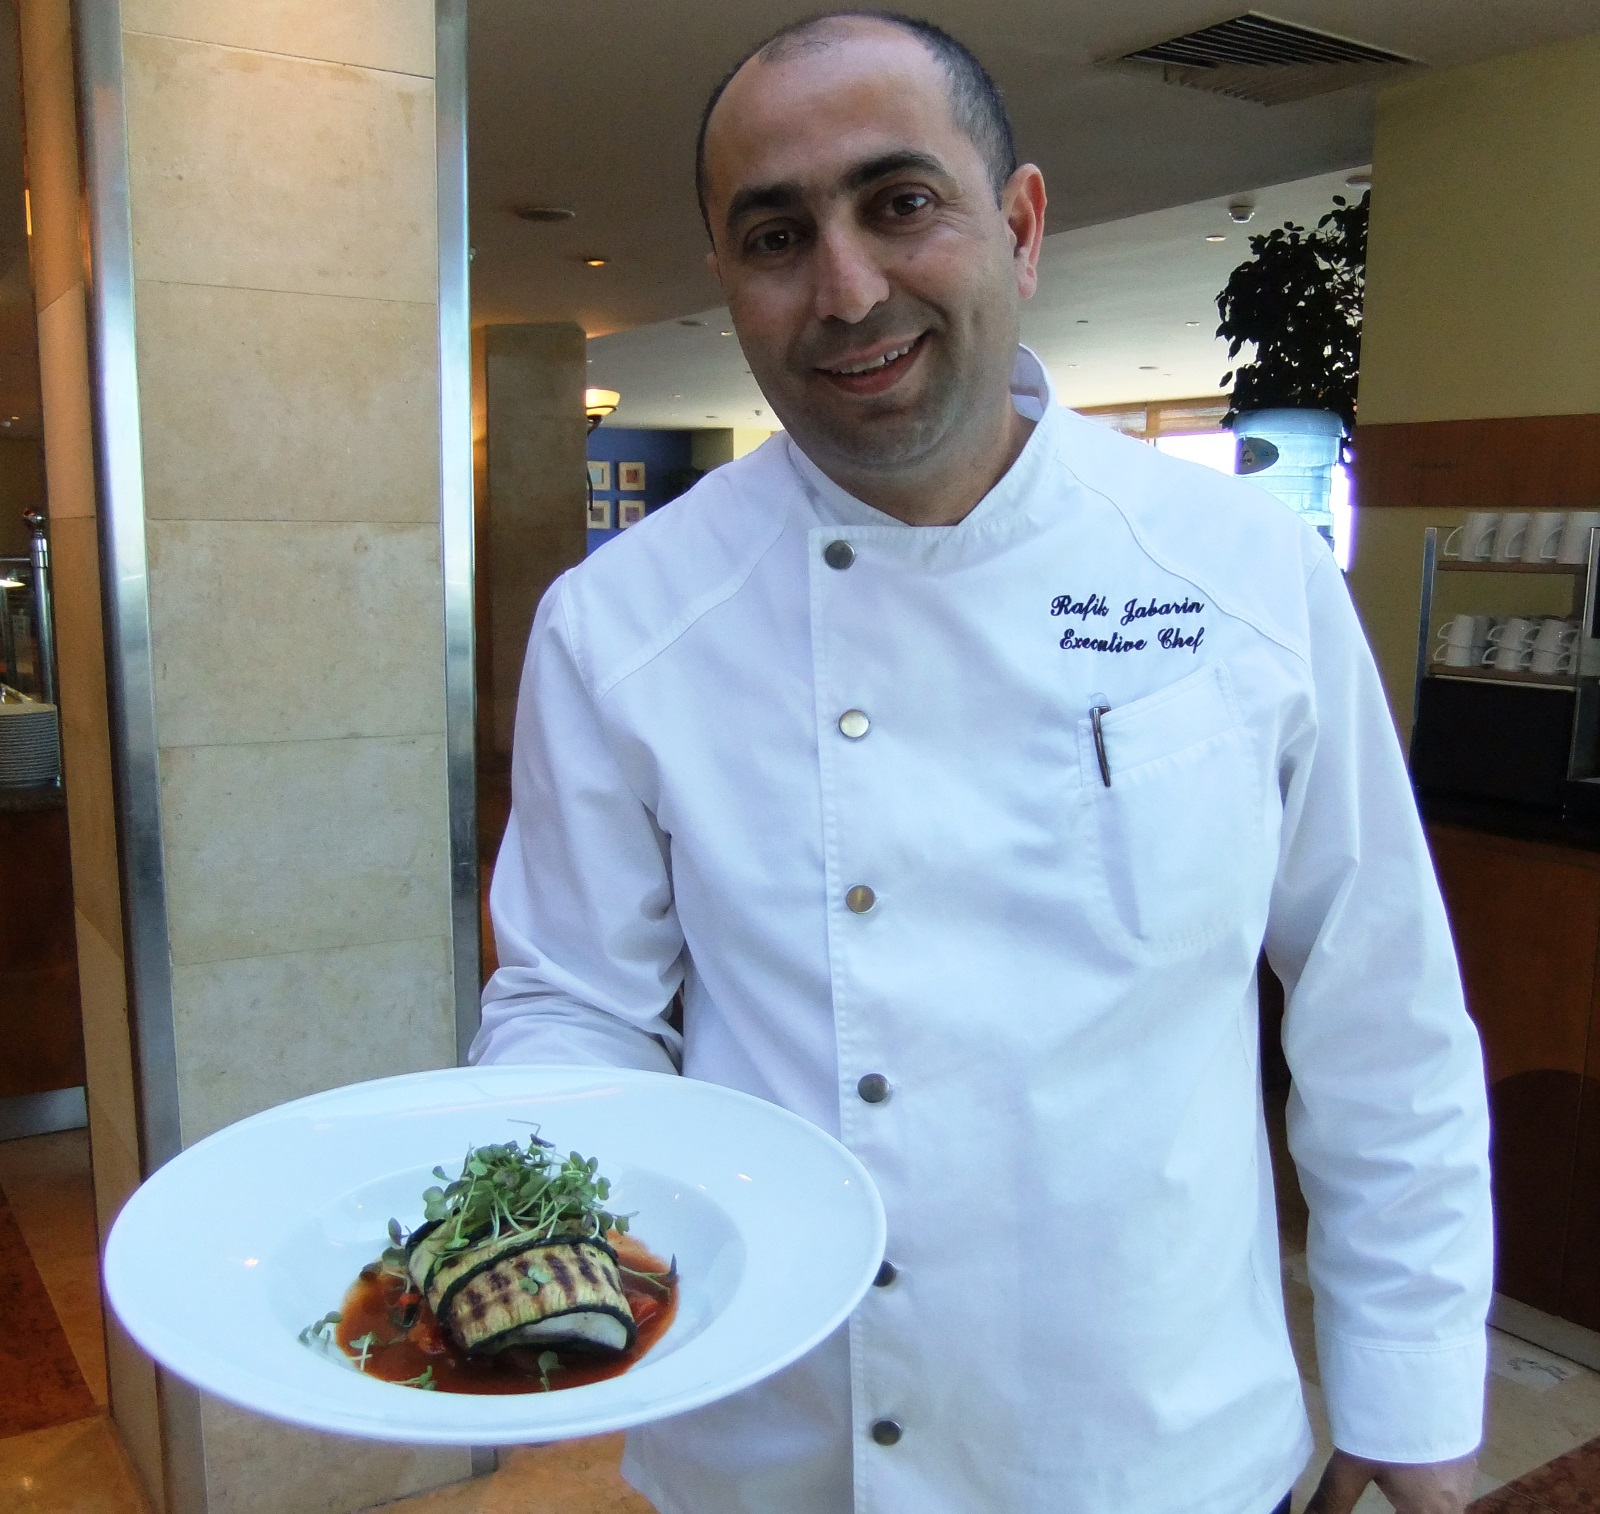 Rafik Jabarin, executive chef of the Tel Aviv Hilton, with his sea bass dish. Photo courtesy of Hilton Worldwide